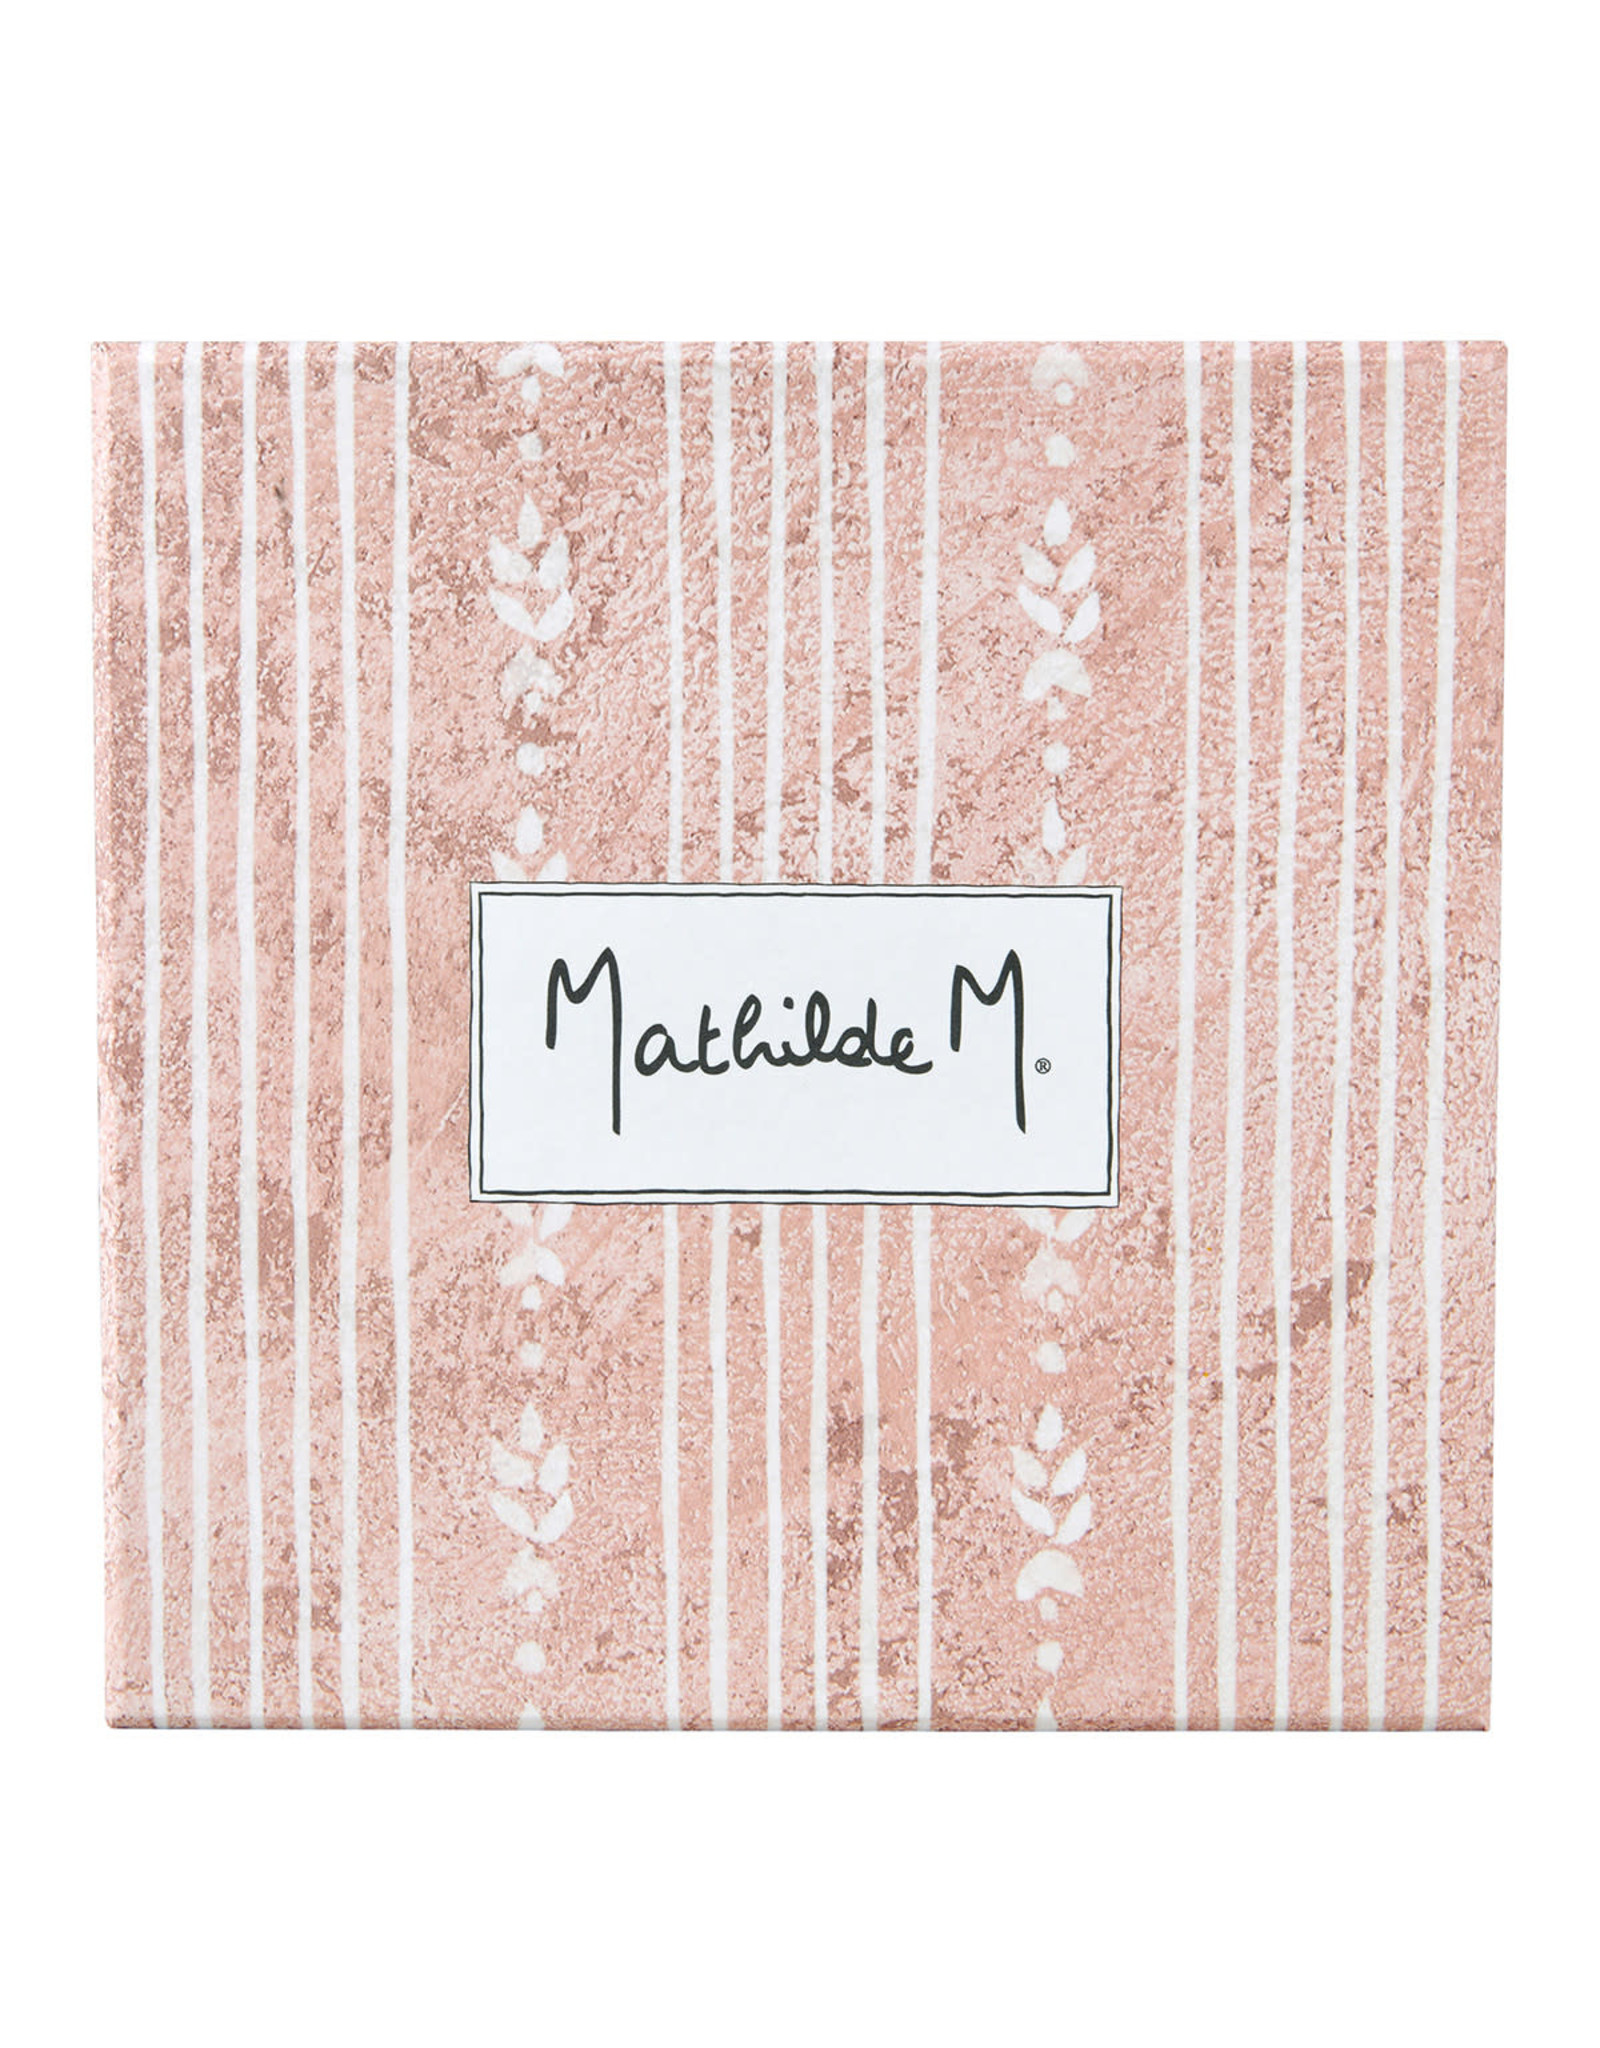 Mathilde M Marquise - Geurdecoratie Droogbloemen